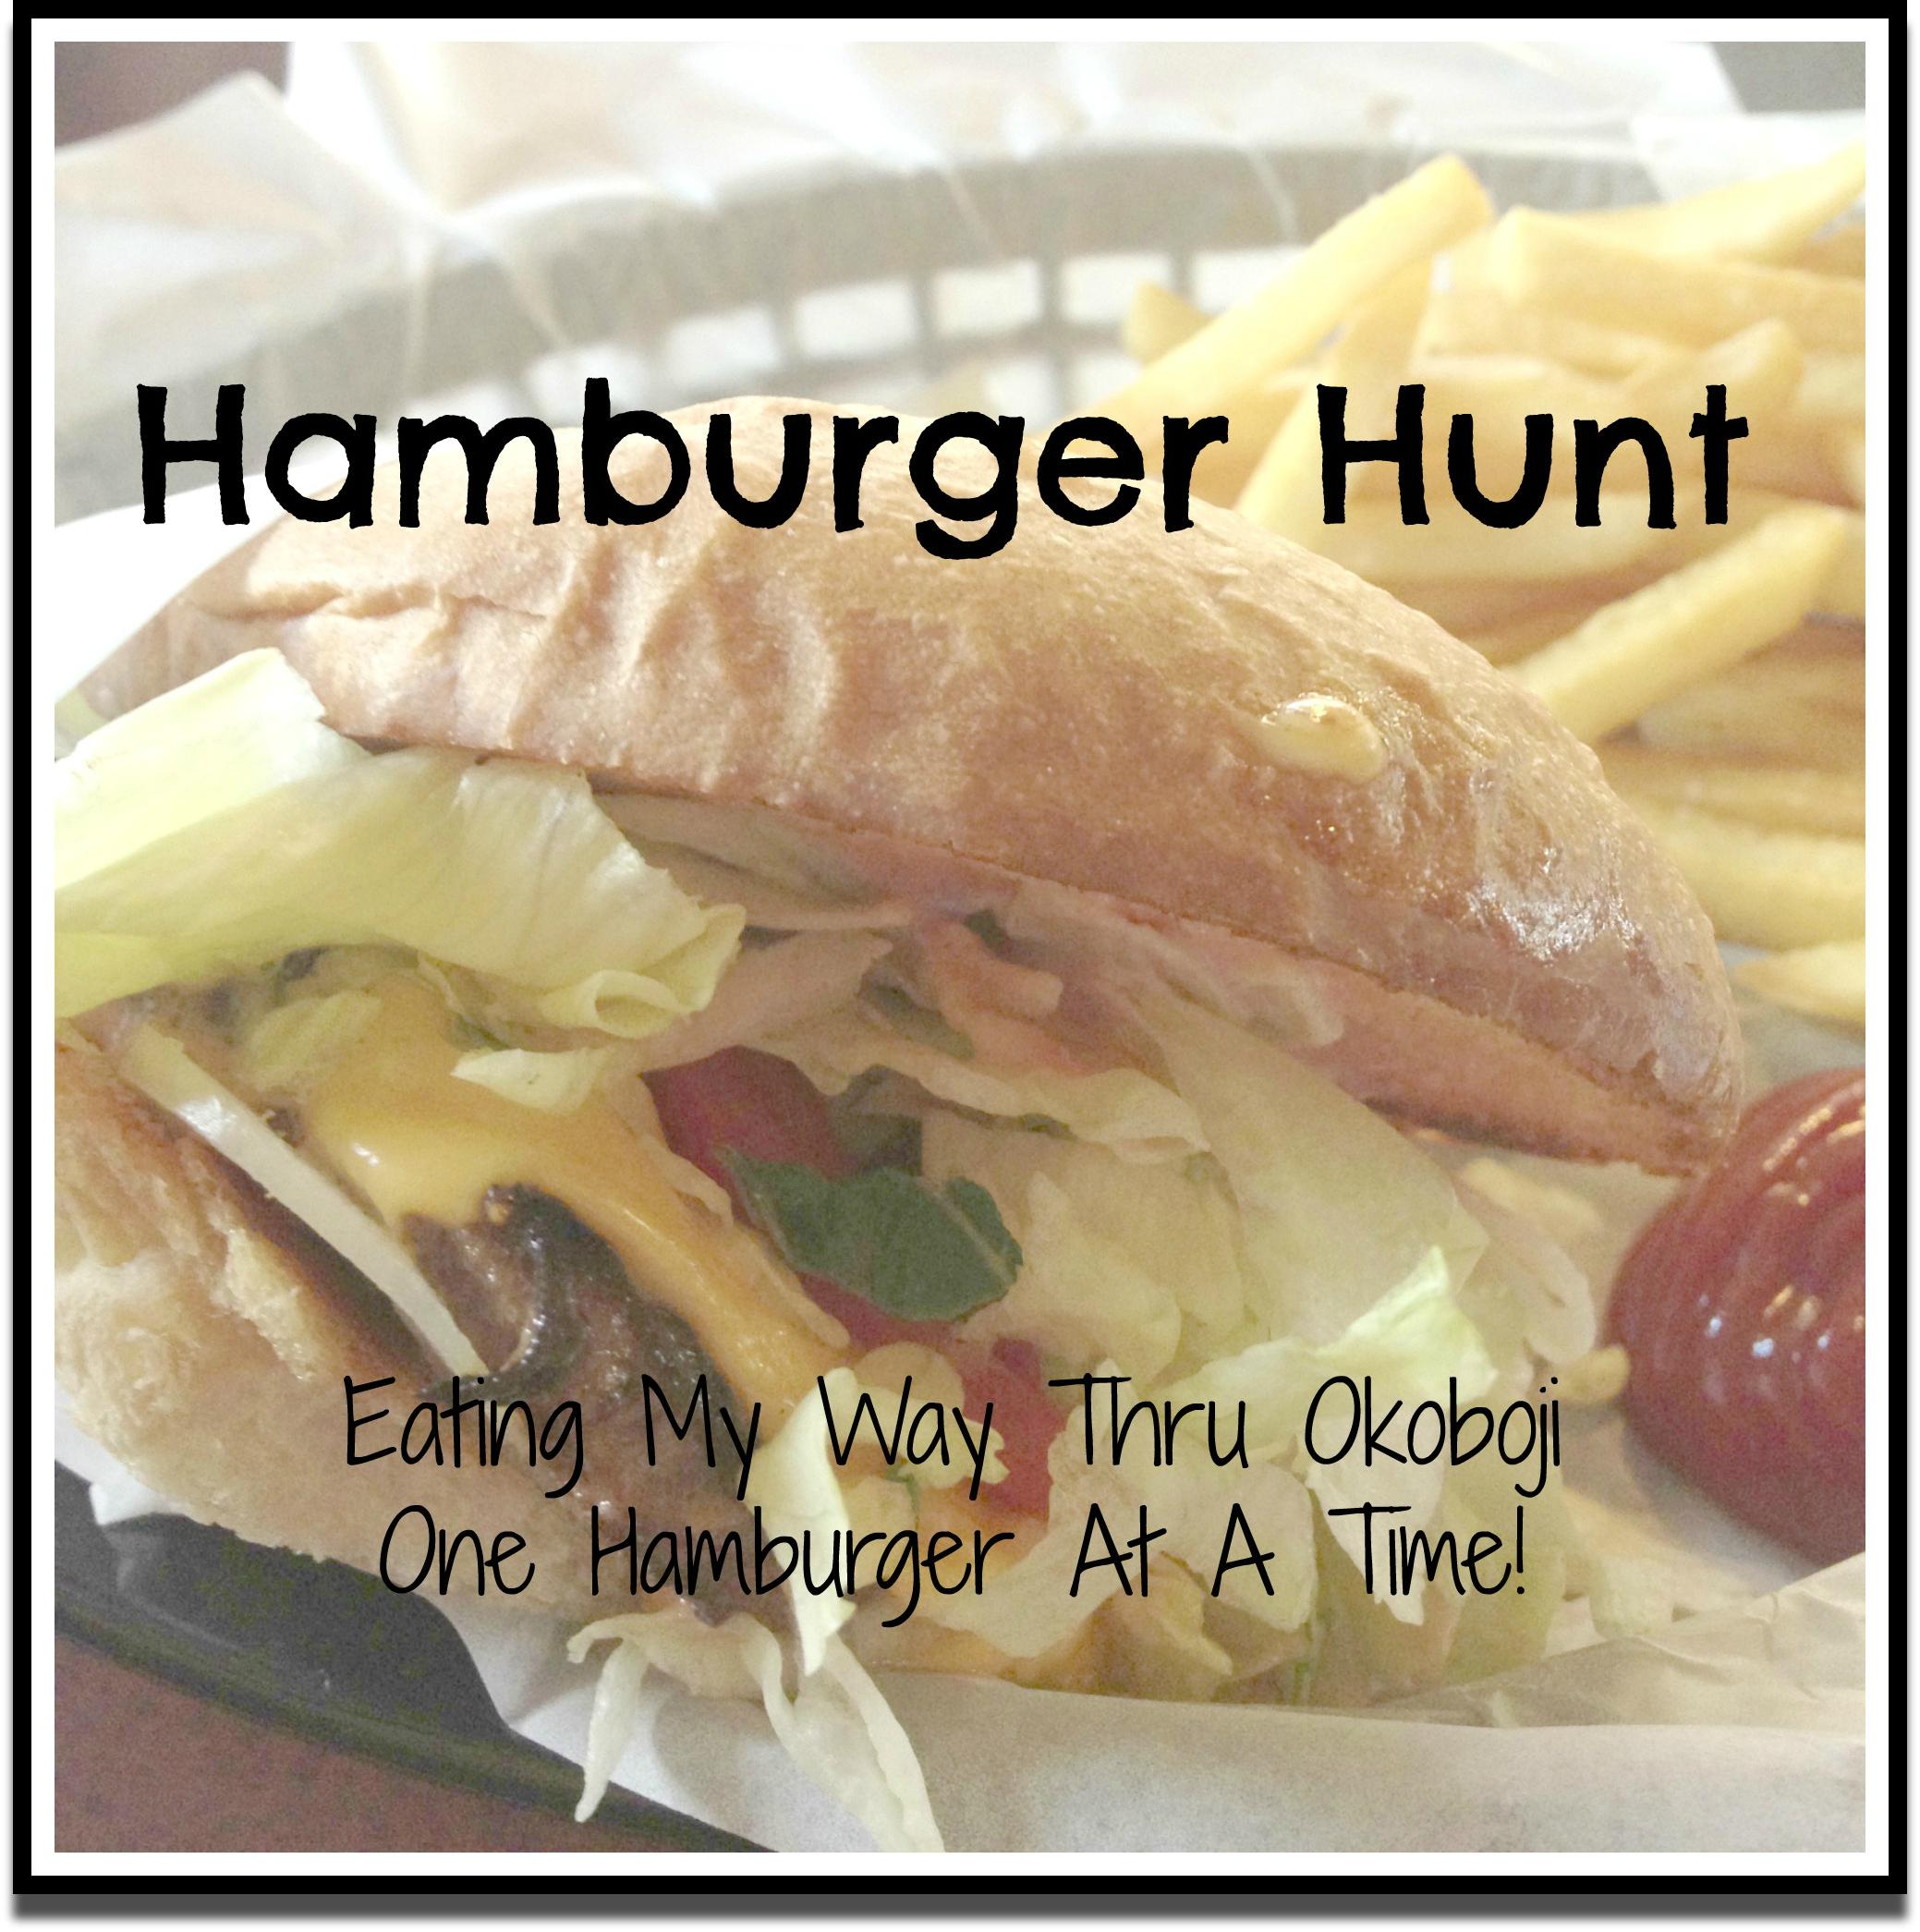 HamburgerHuntLogo